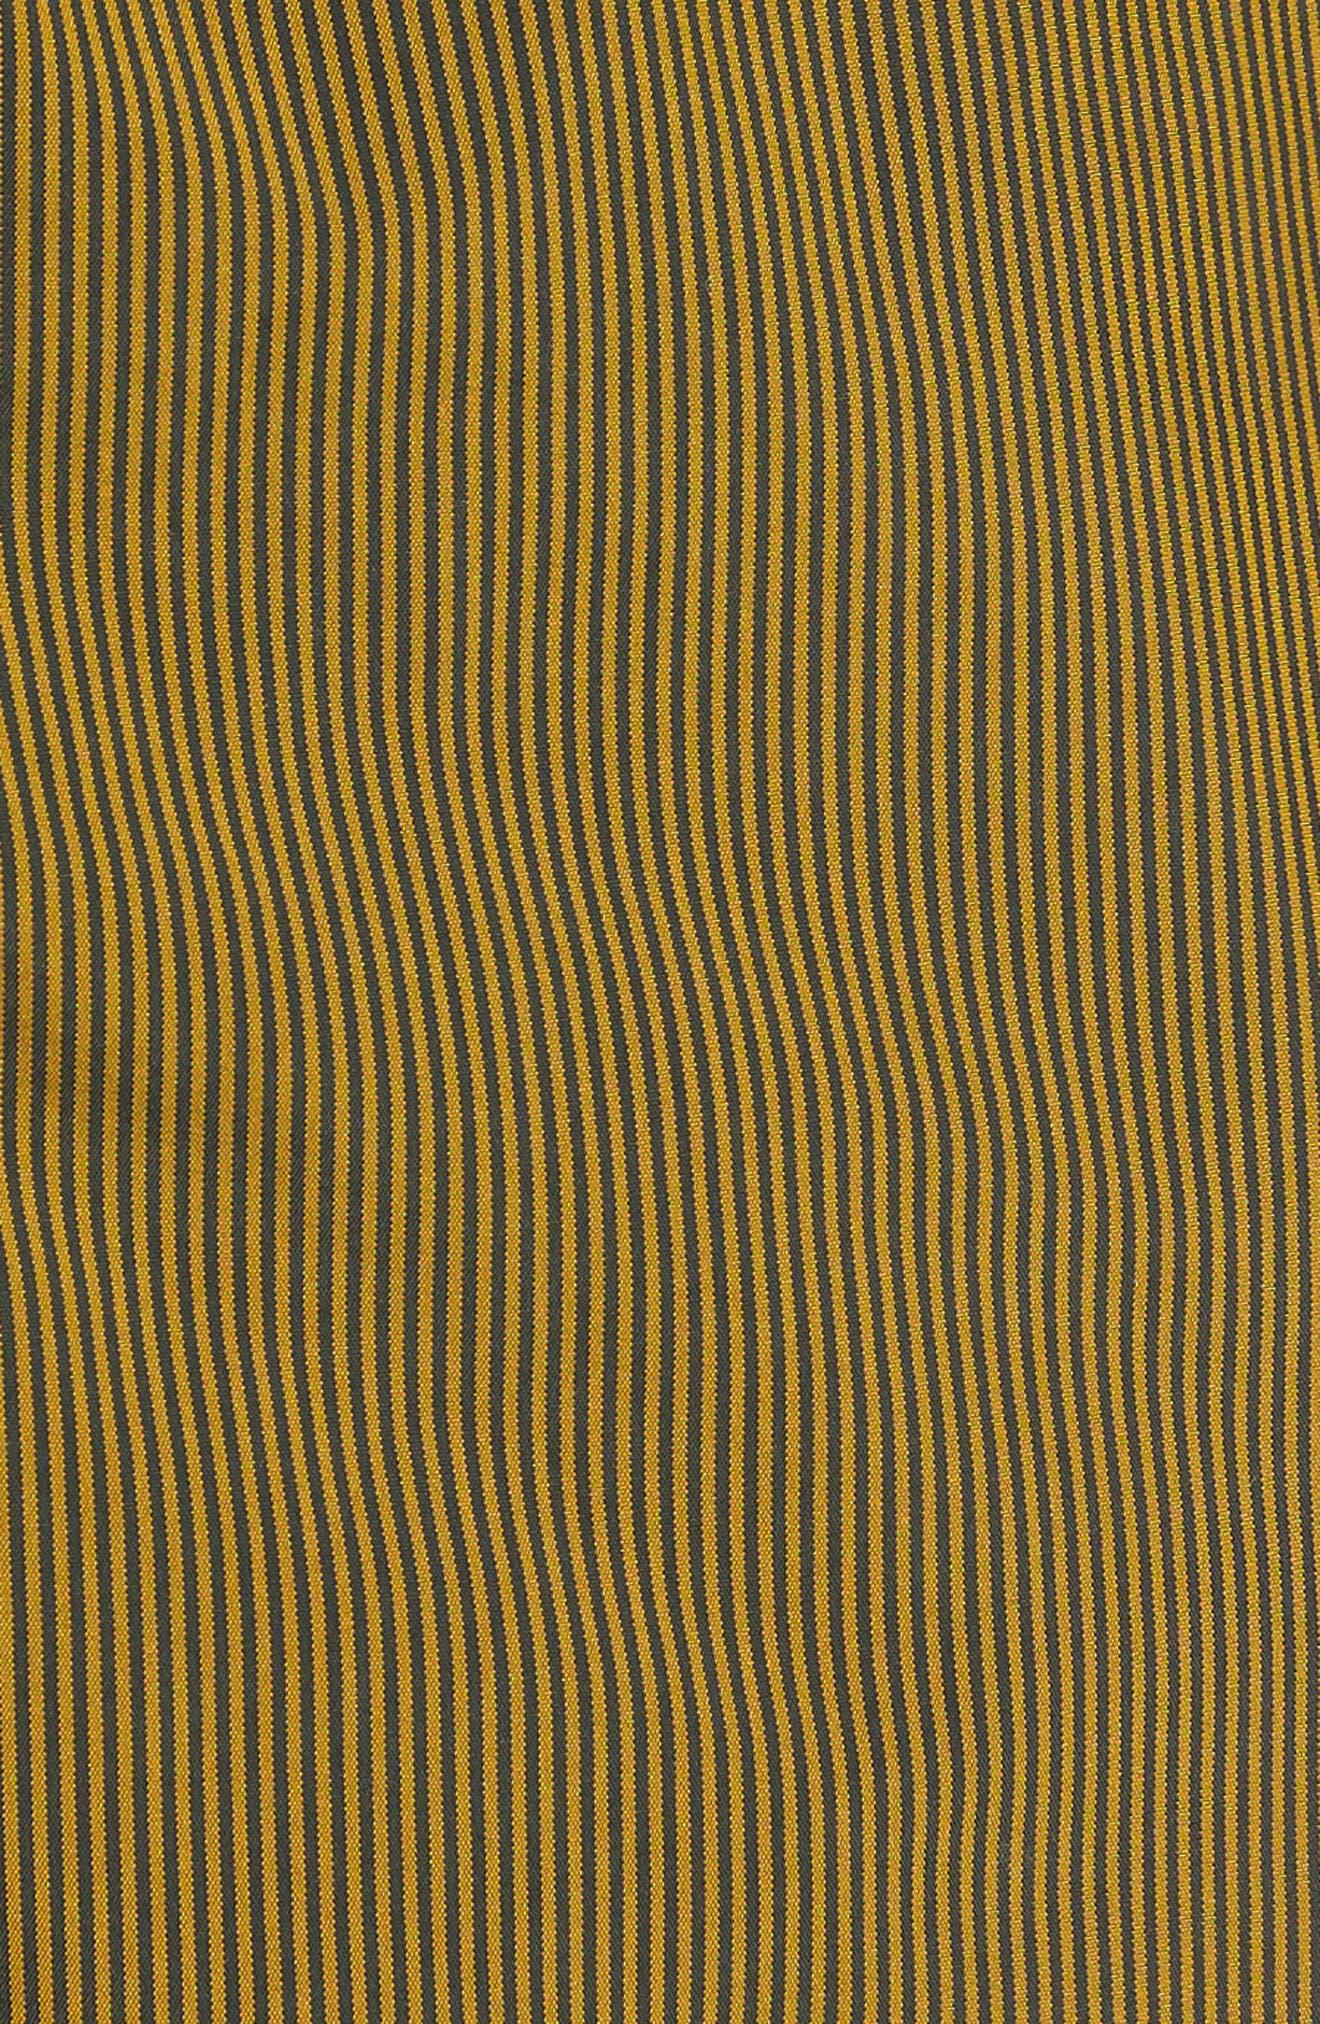 Microstripes Swim Trunks,                             Alternate thumbnail 5, color,                             Curcuma